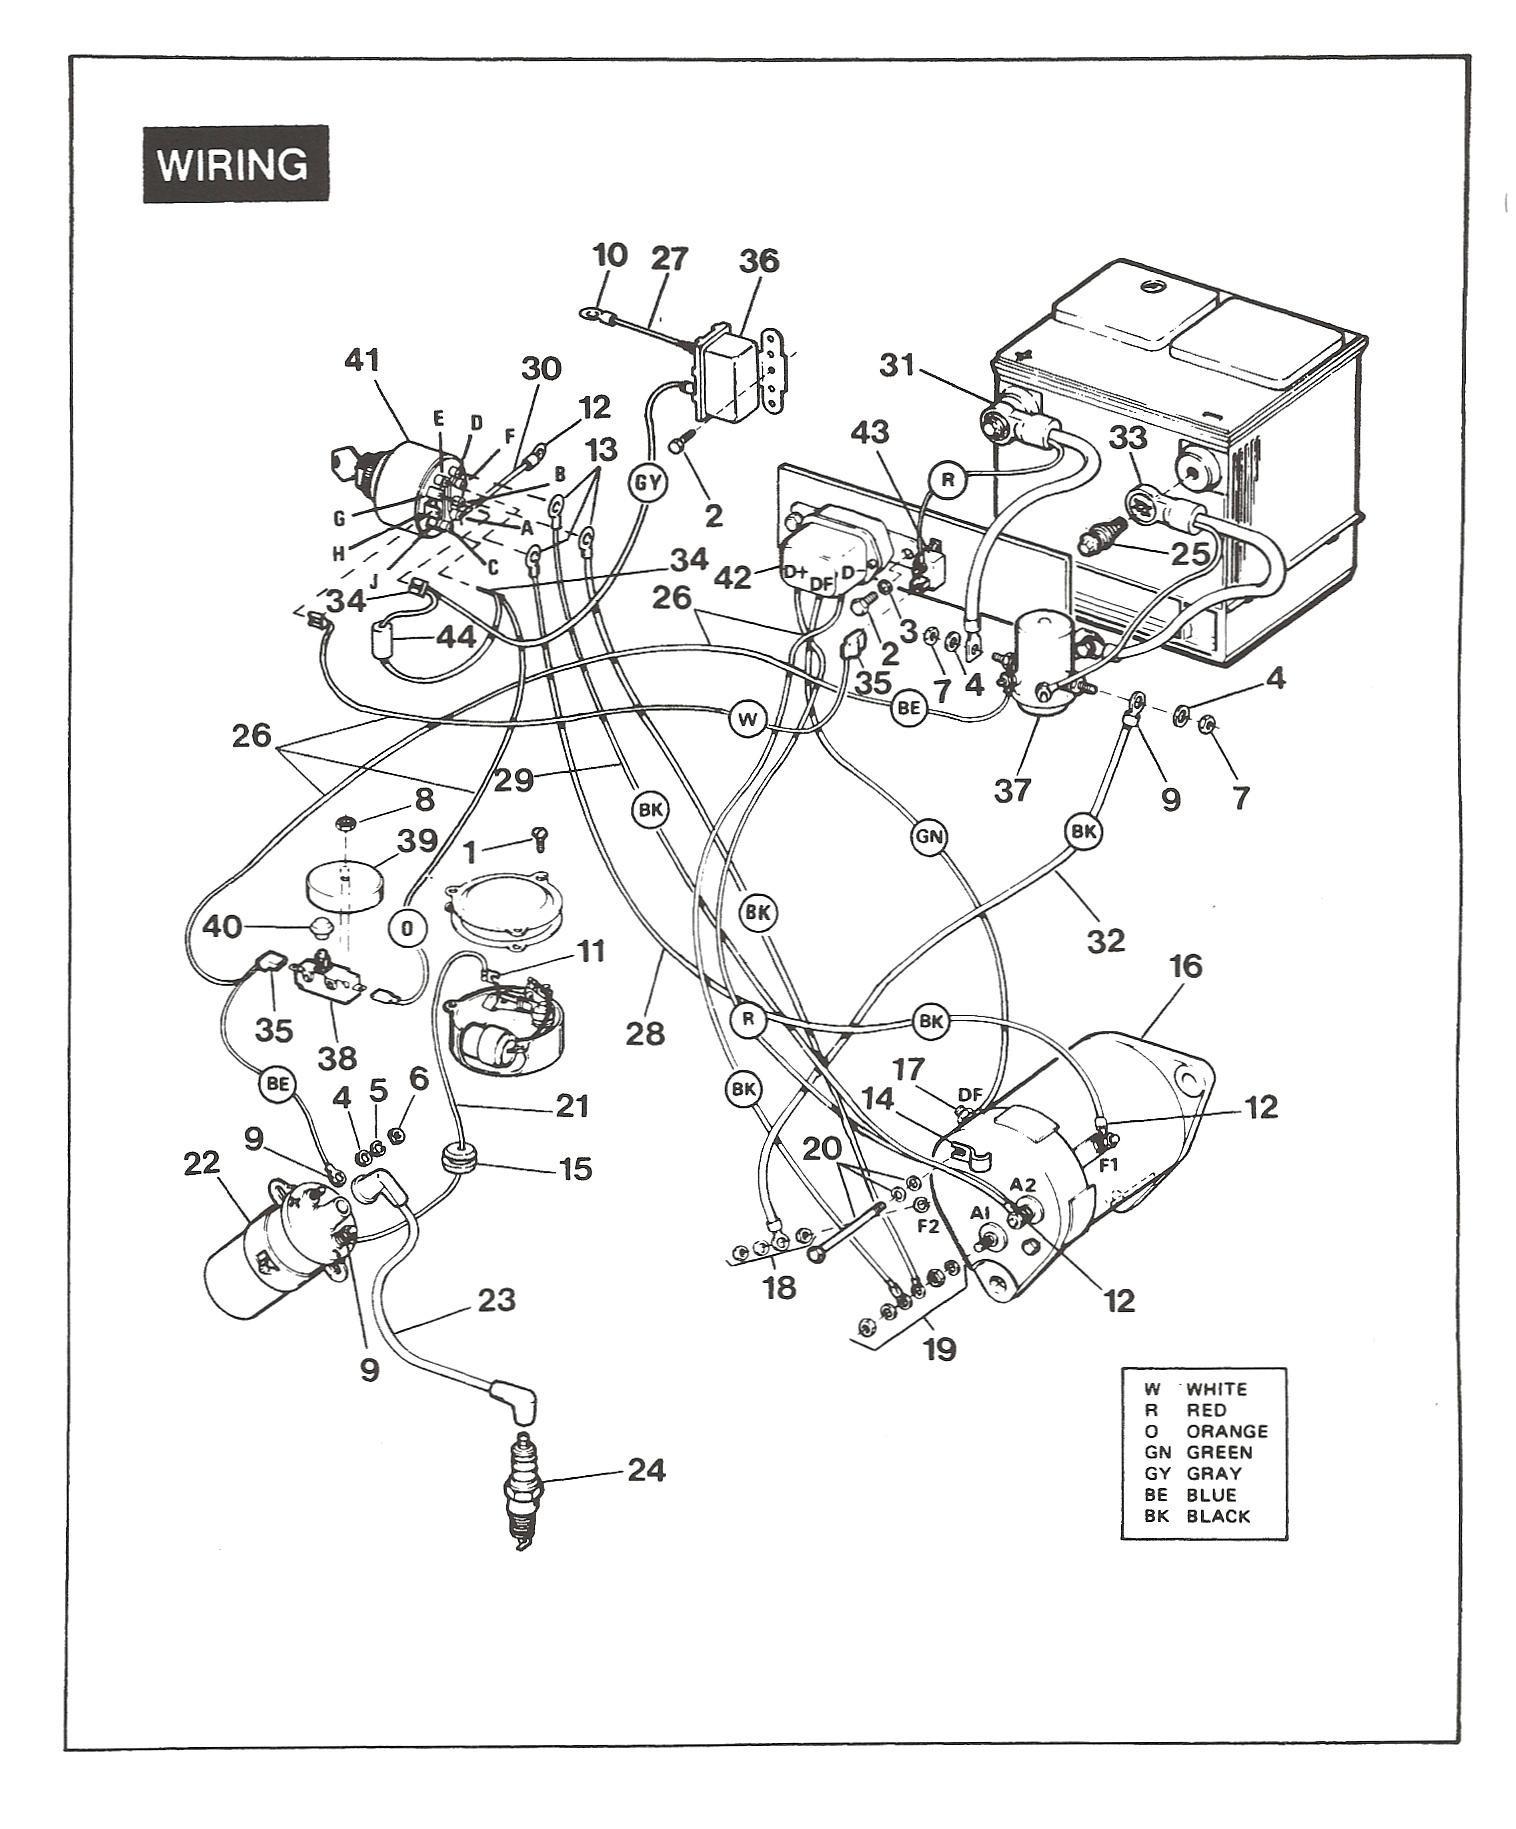 Ezgo Electric Golf Cart Wiring Diagram